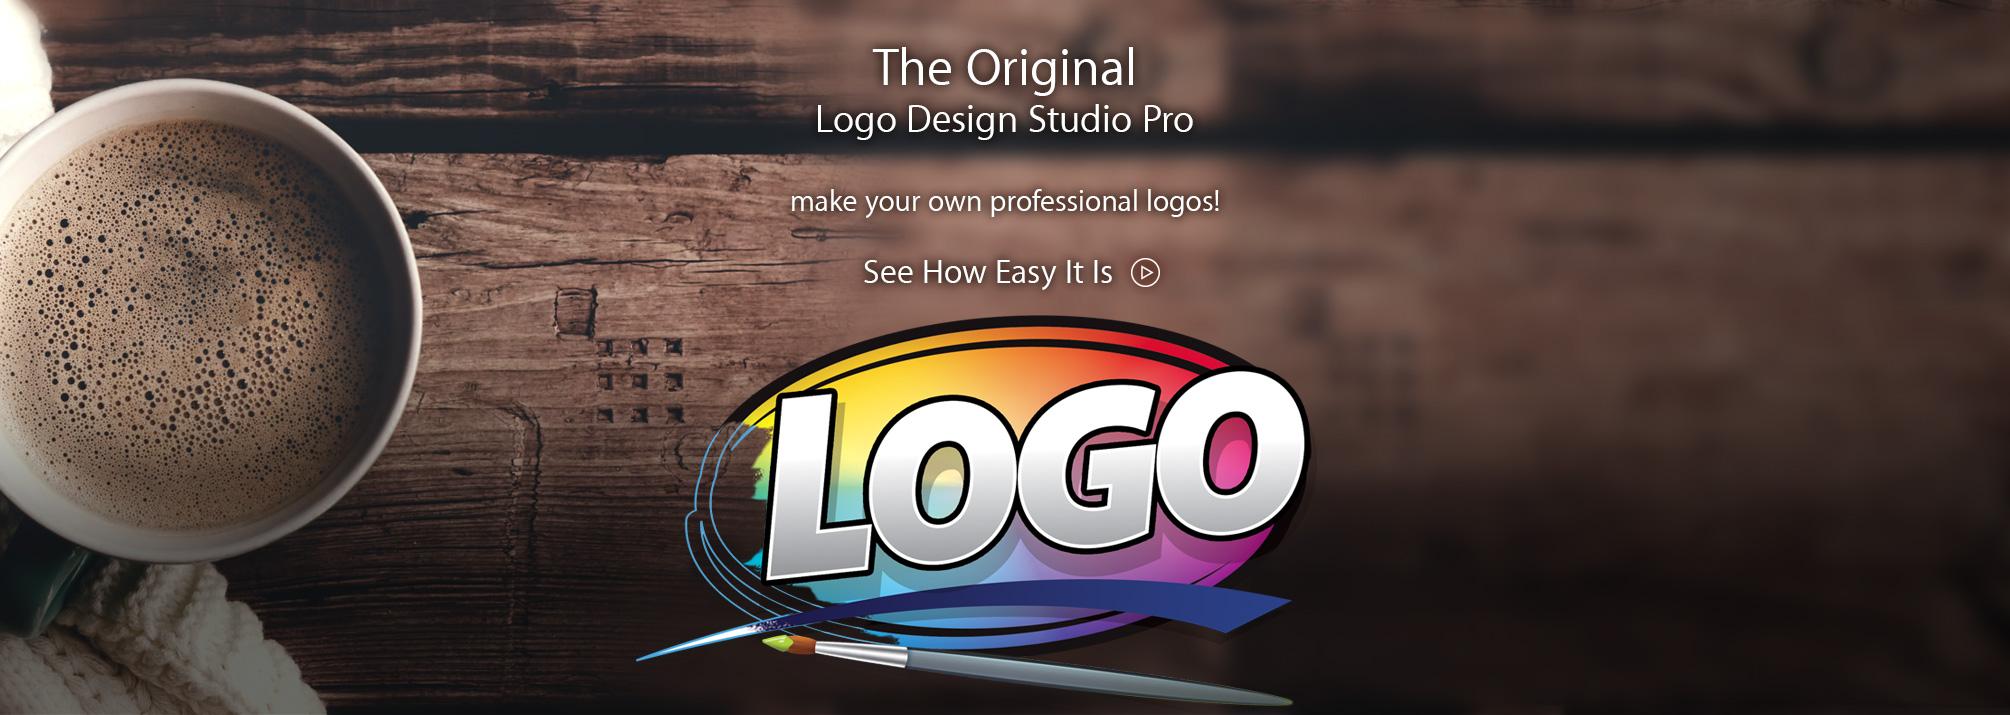 Logo design pro software